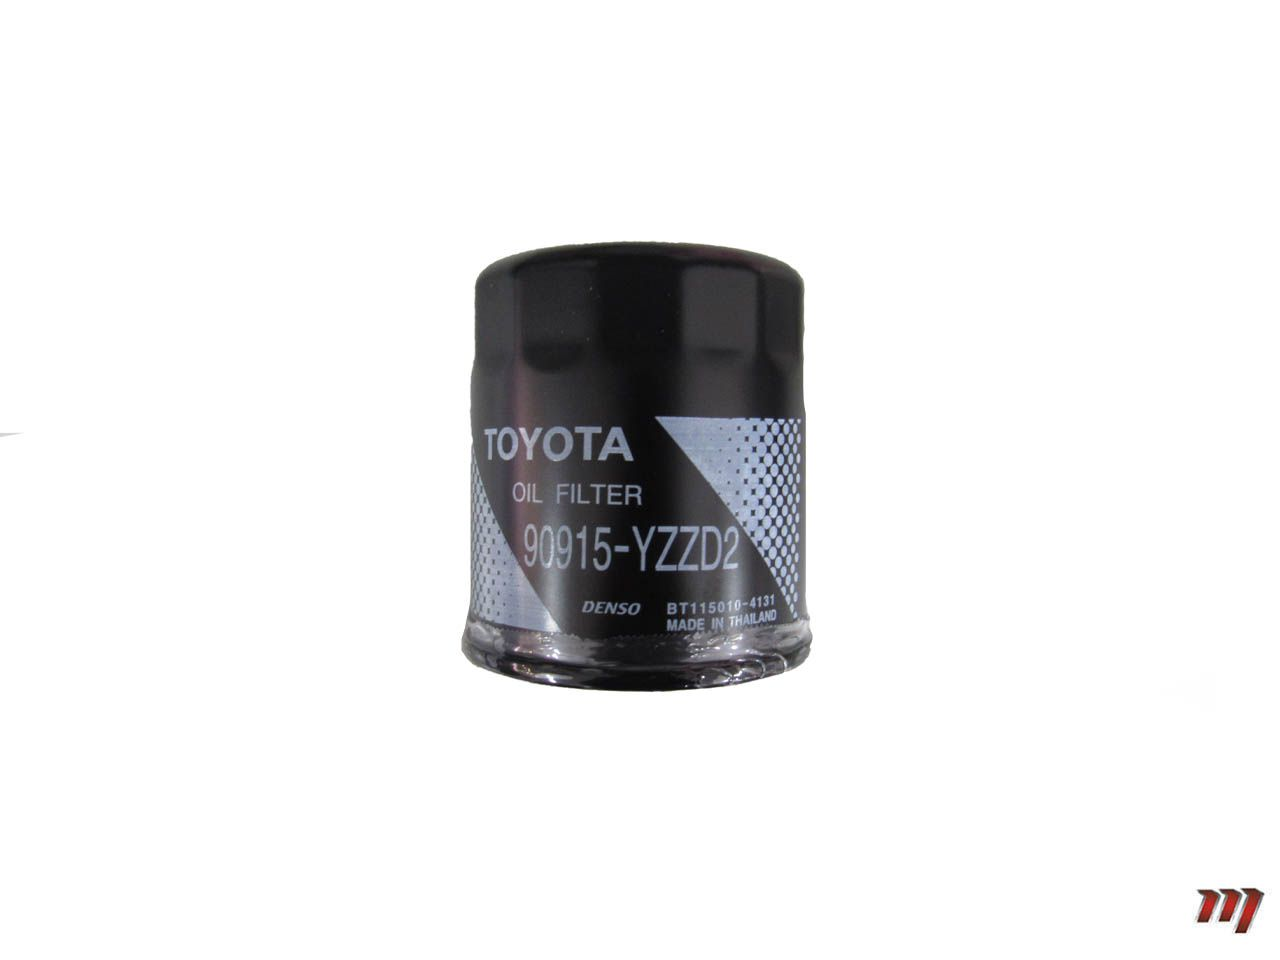 Filtro de Óleo Hilux 2.5 3.0 DIESEL 2005 a 2016  - Mirai Peças Toyota